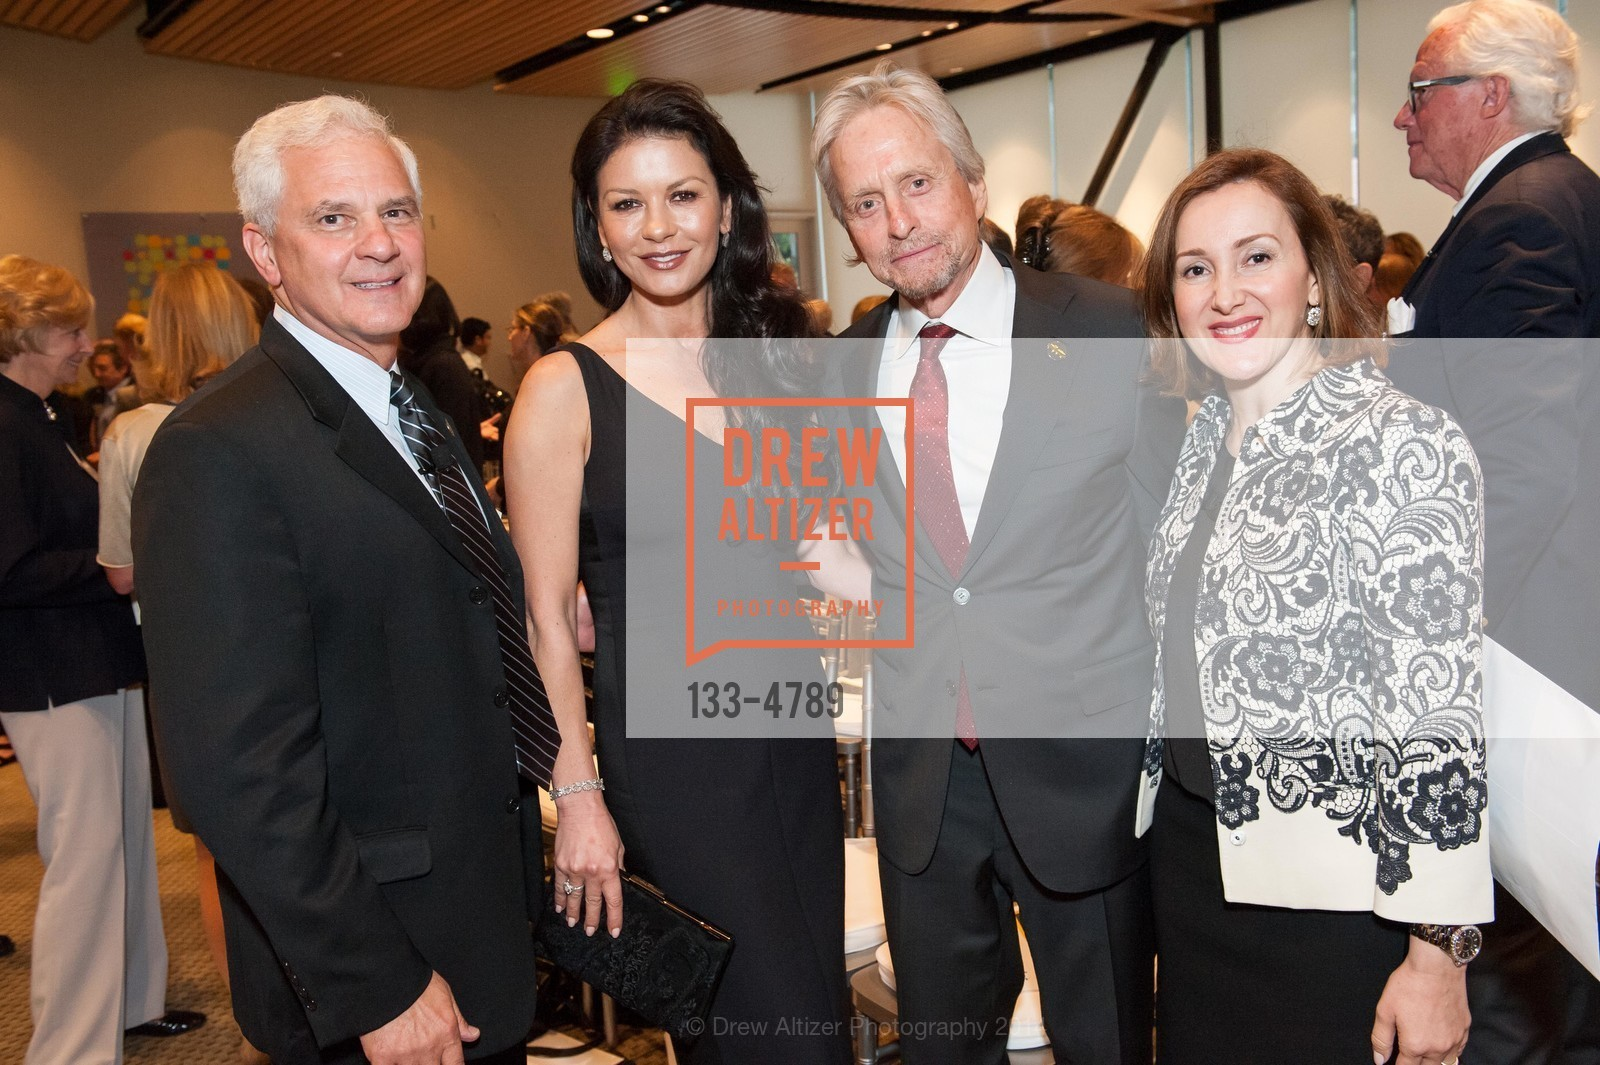 Joe Cirincione, Catherine Zeta-Jones, Michael Douglas, Noosheen Hashemi, Photo #133-4789